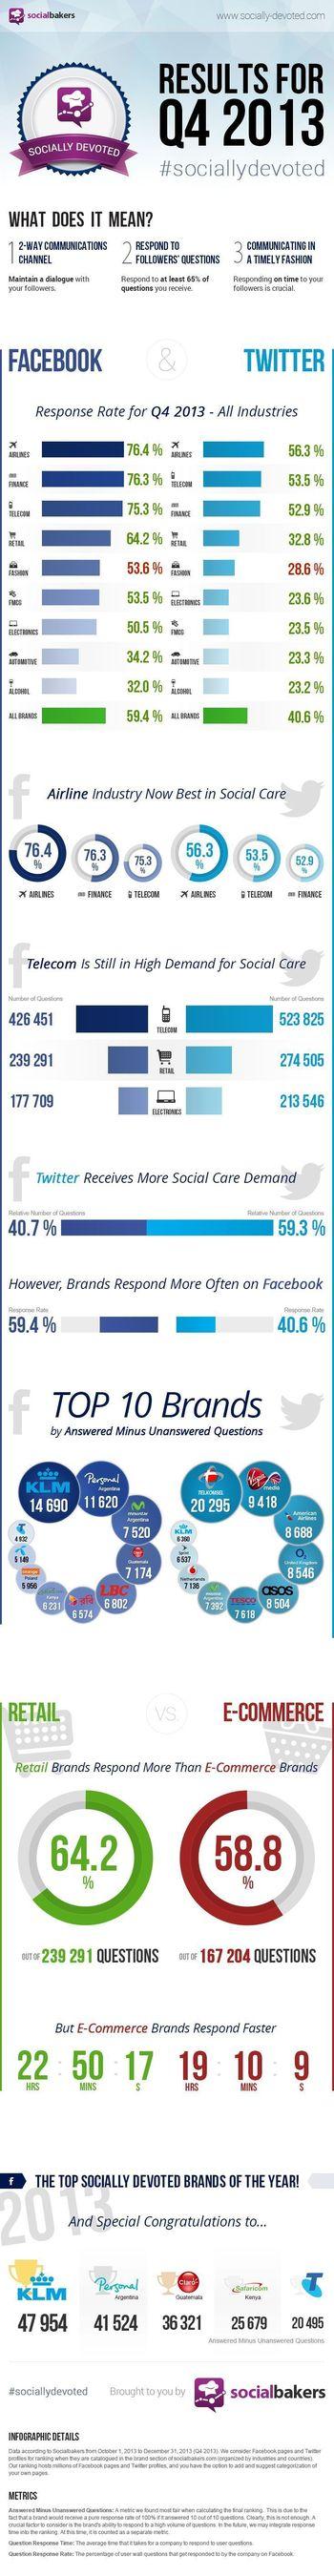 Socially Devoted Brands, Q4 2014